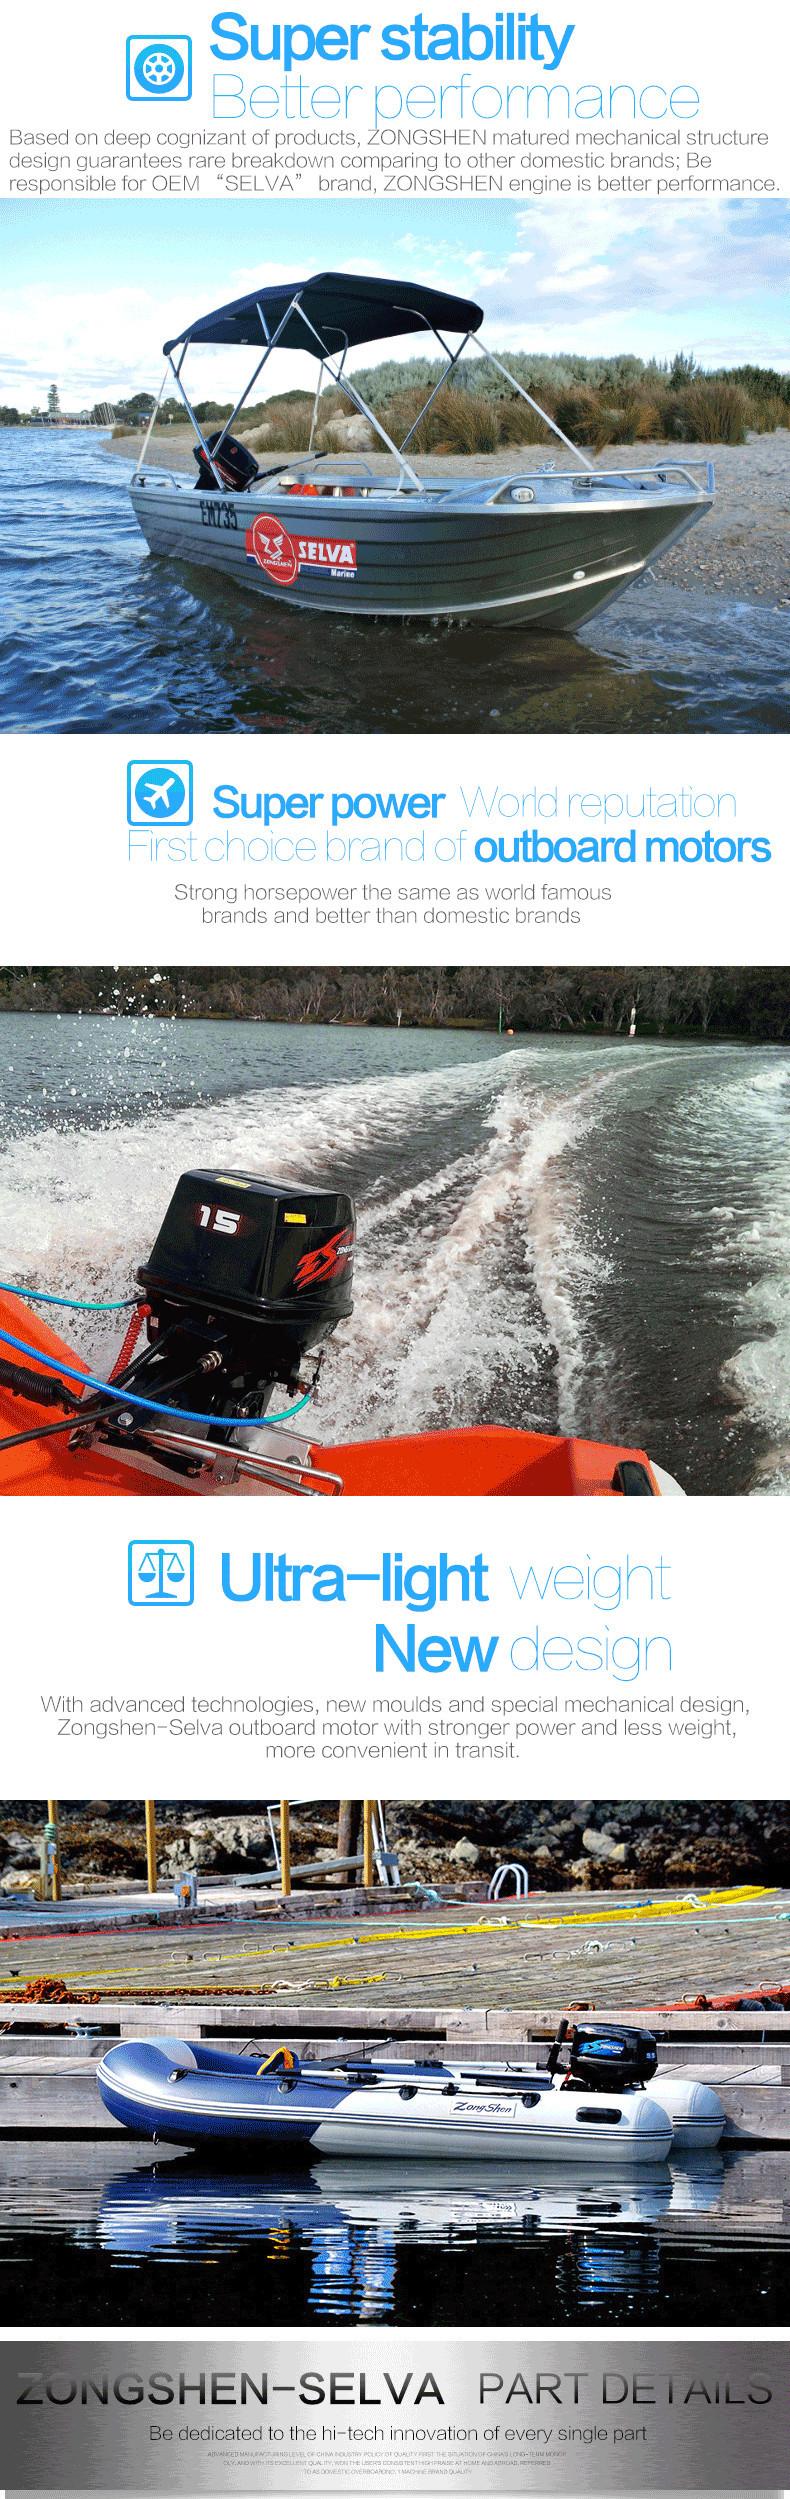 9.9hp/15hp/25hp/30hp/40hp Boat Engine Outboard Motor